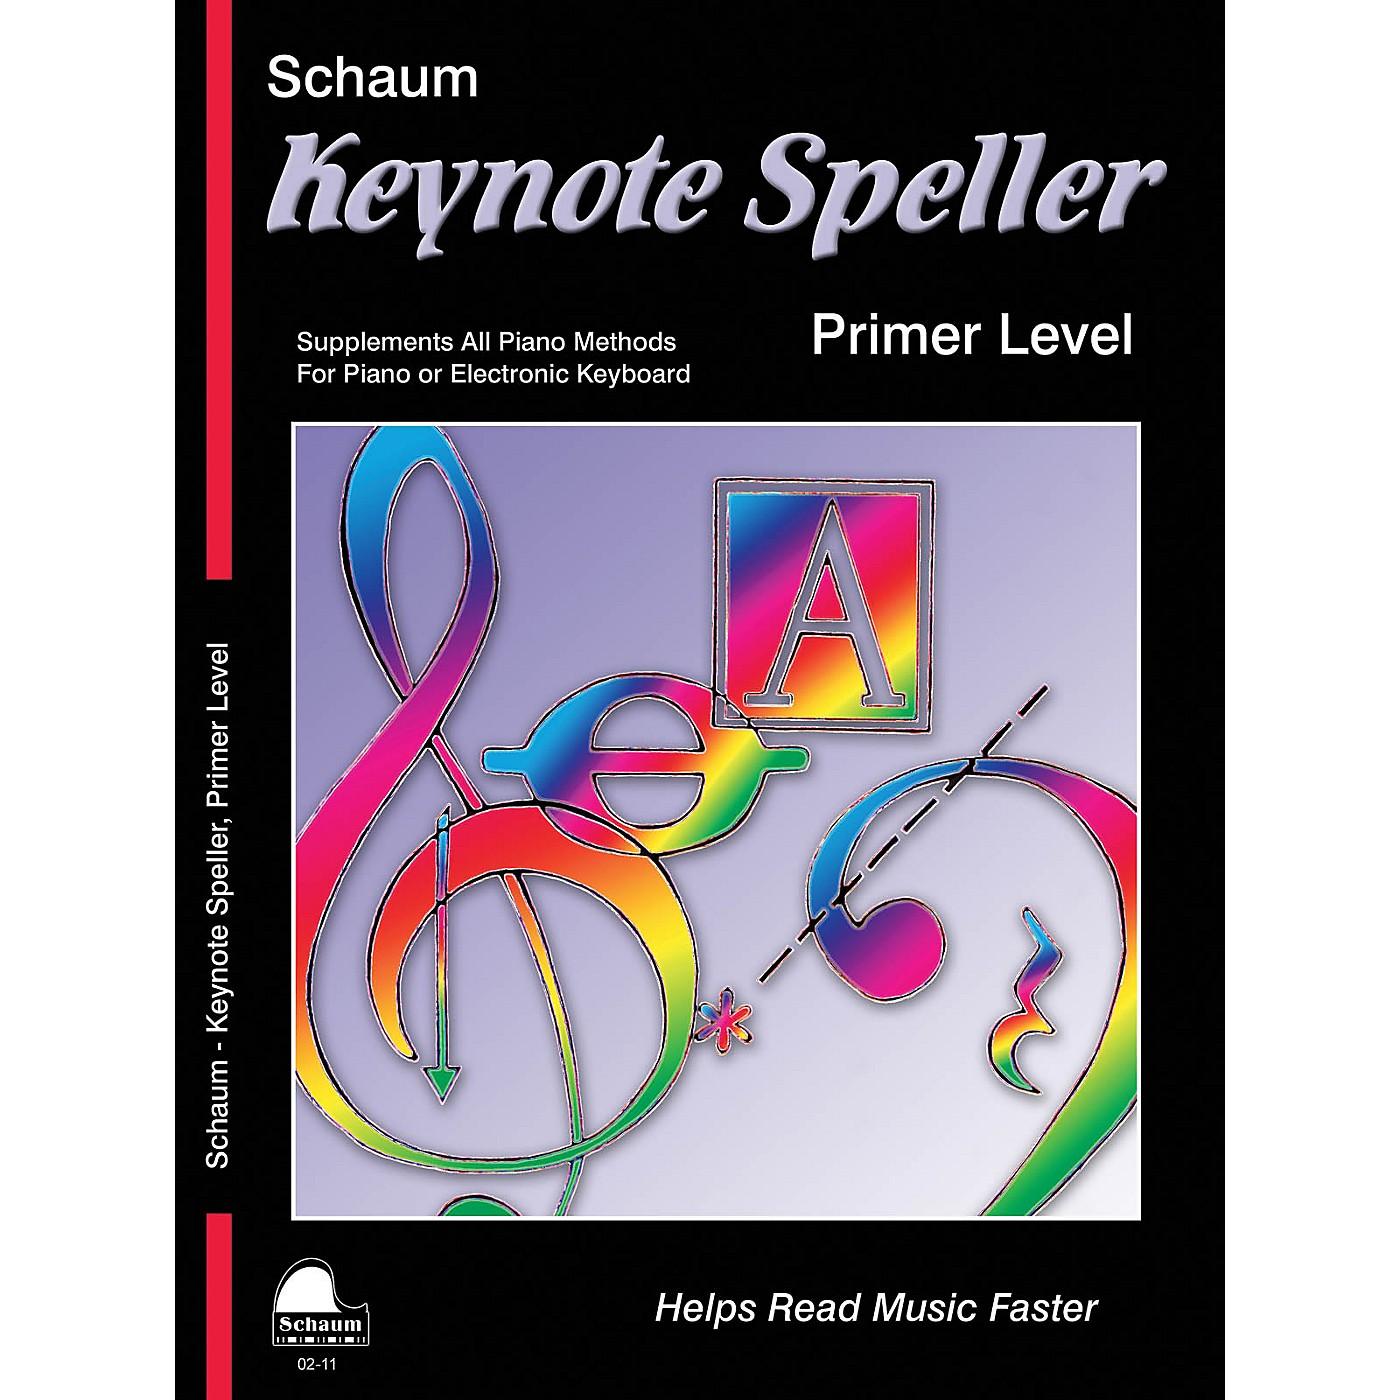 SCHAUM Keynote Speller Primer Level Educational Piano Book by John W. Schaum thumbnail